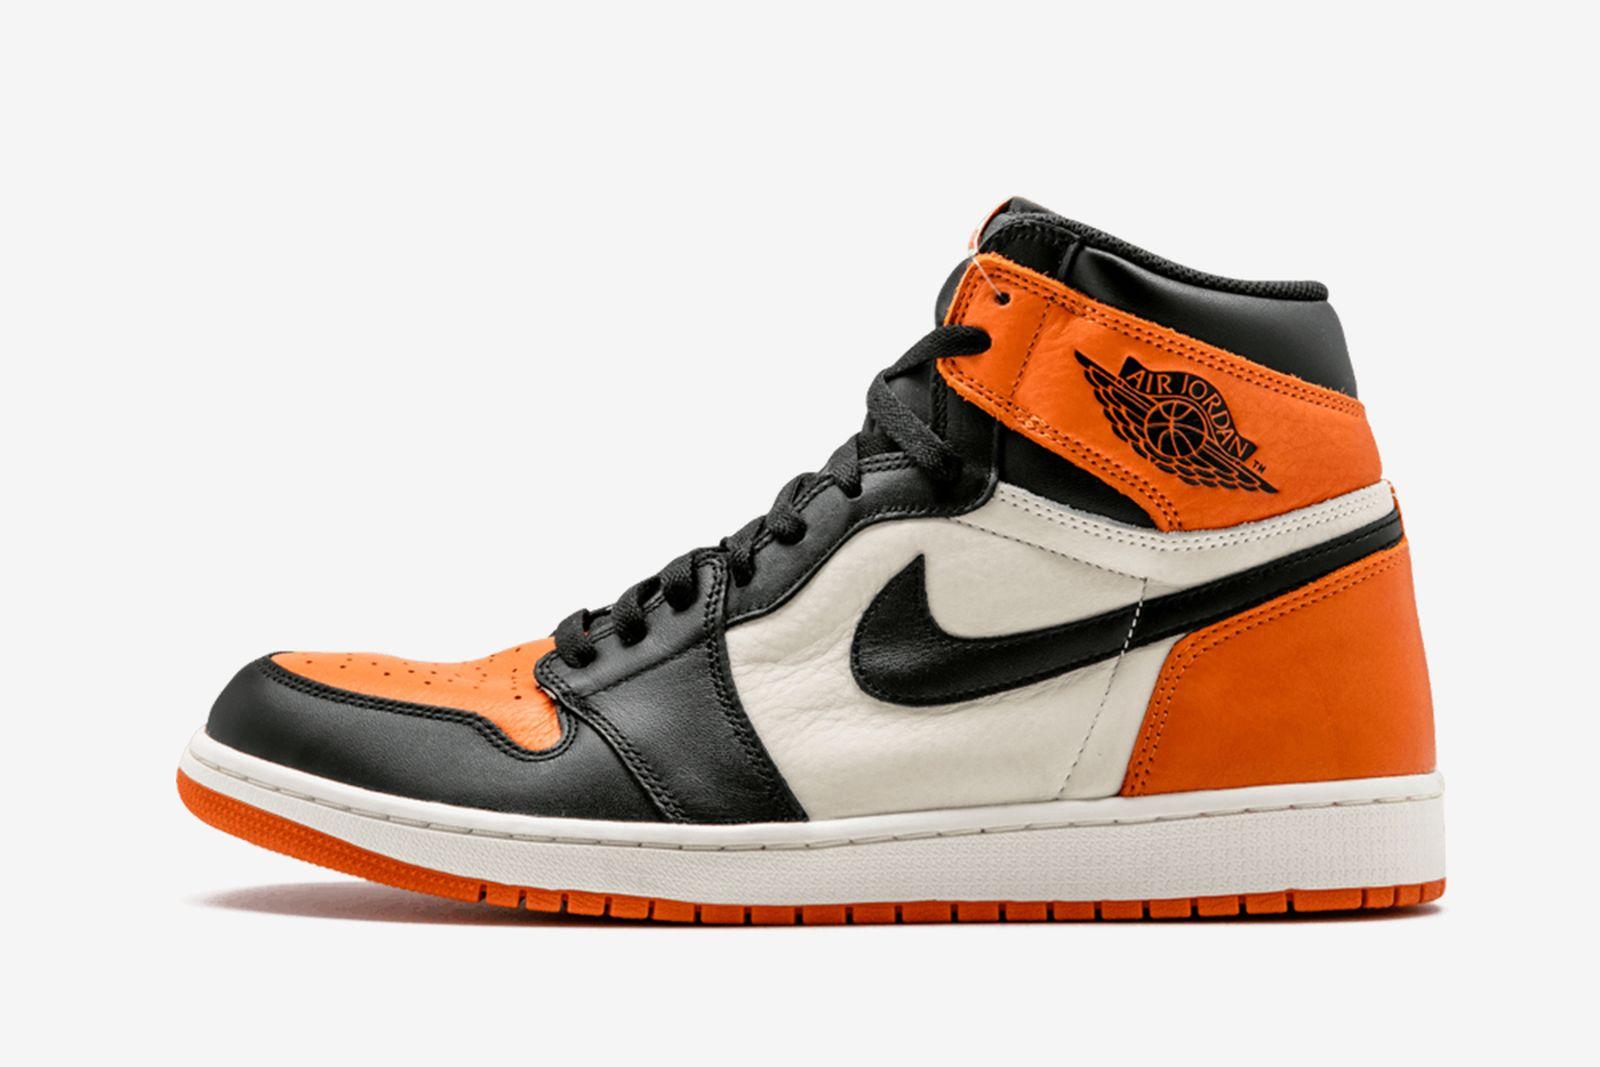 jordan shattered backboard history Nike michael jordan